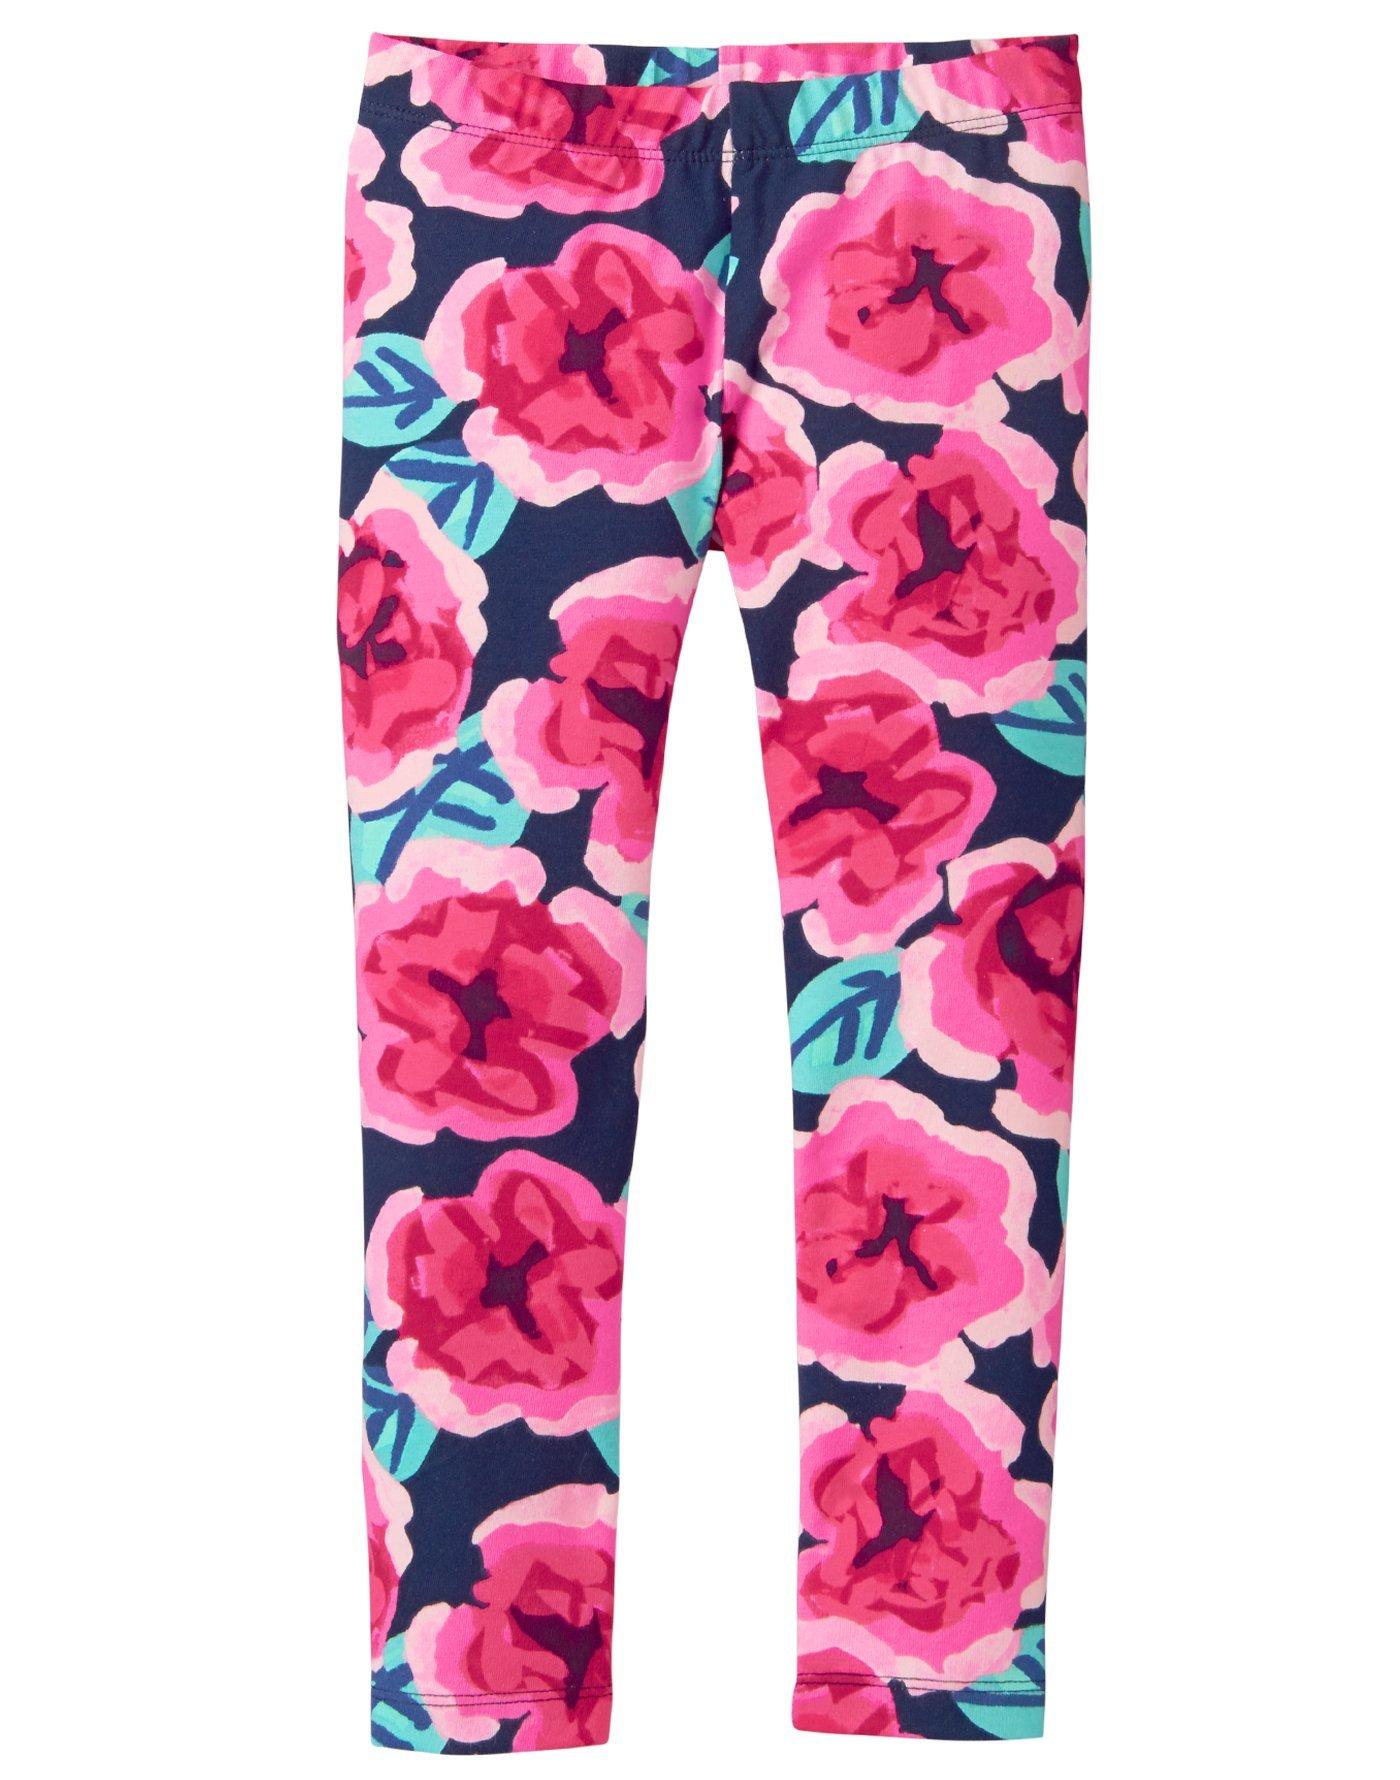 Gymboree Little Girls' Basic Print Legging, Large Floral Print, M by Gymboree (Image #1)